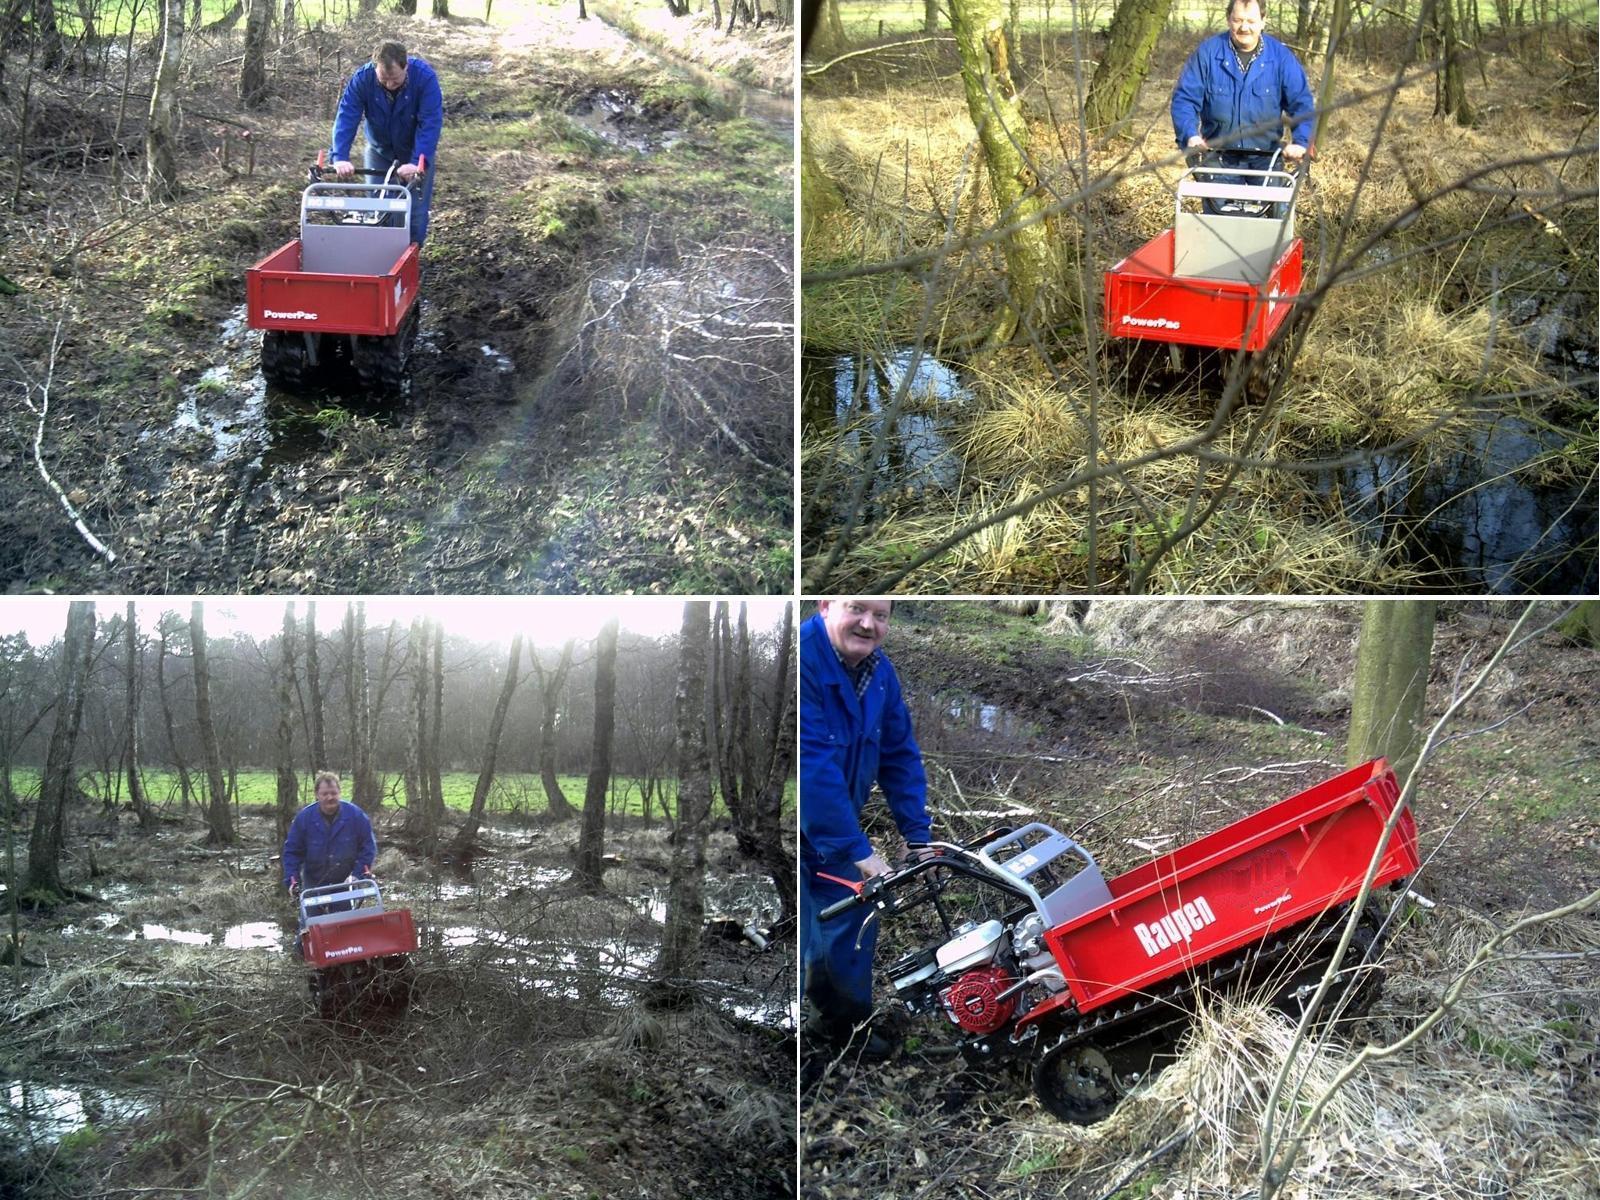 Small Transporter Machines Motorised Wheelbarrow Electric Fisher Plow Headlight Wiring Diagram Special Construction